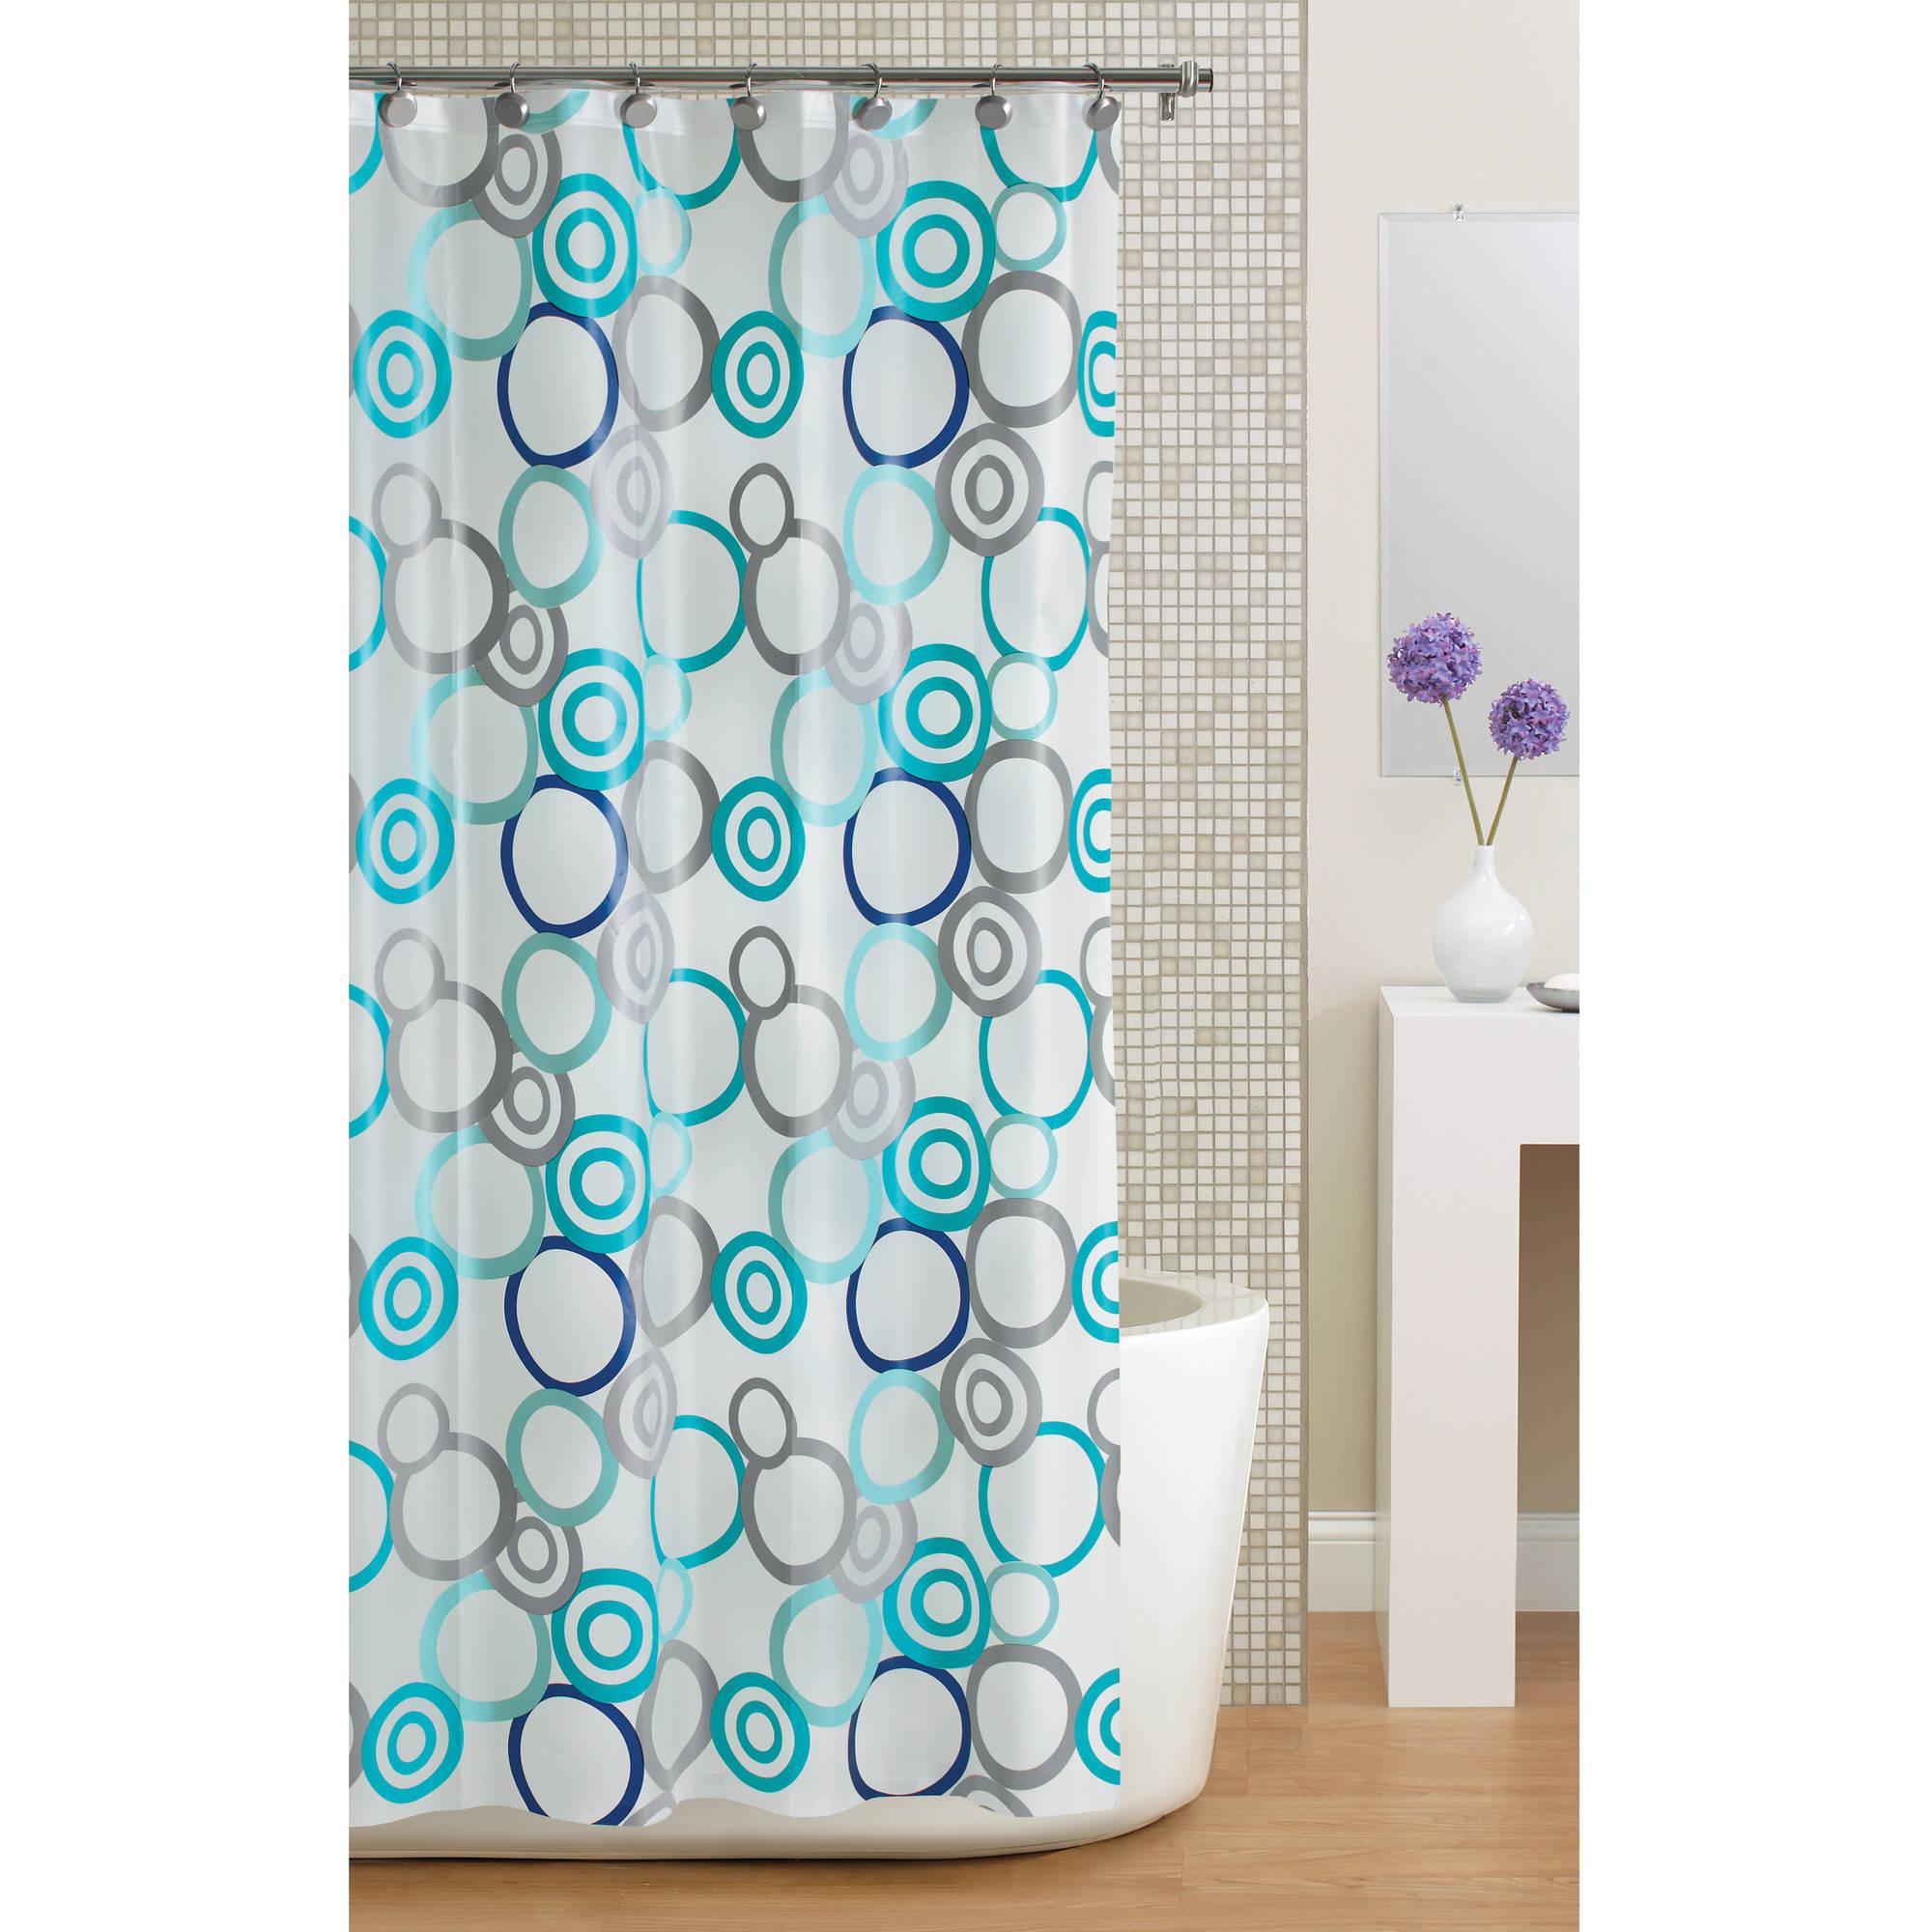 Mainstays Circles PEVA Shower Curtain, Frosty